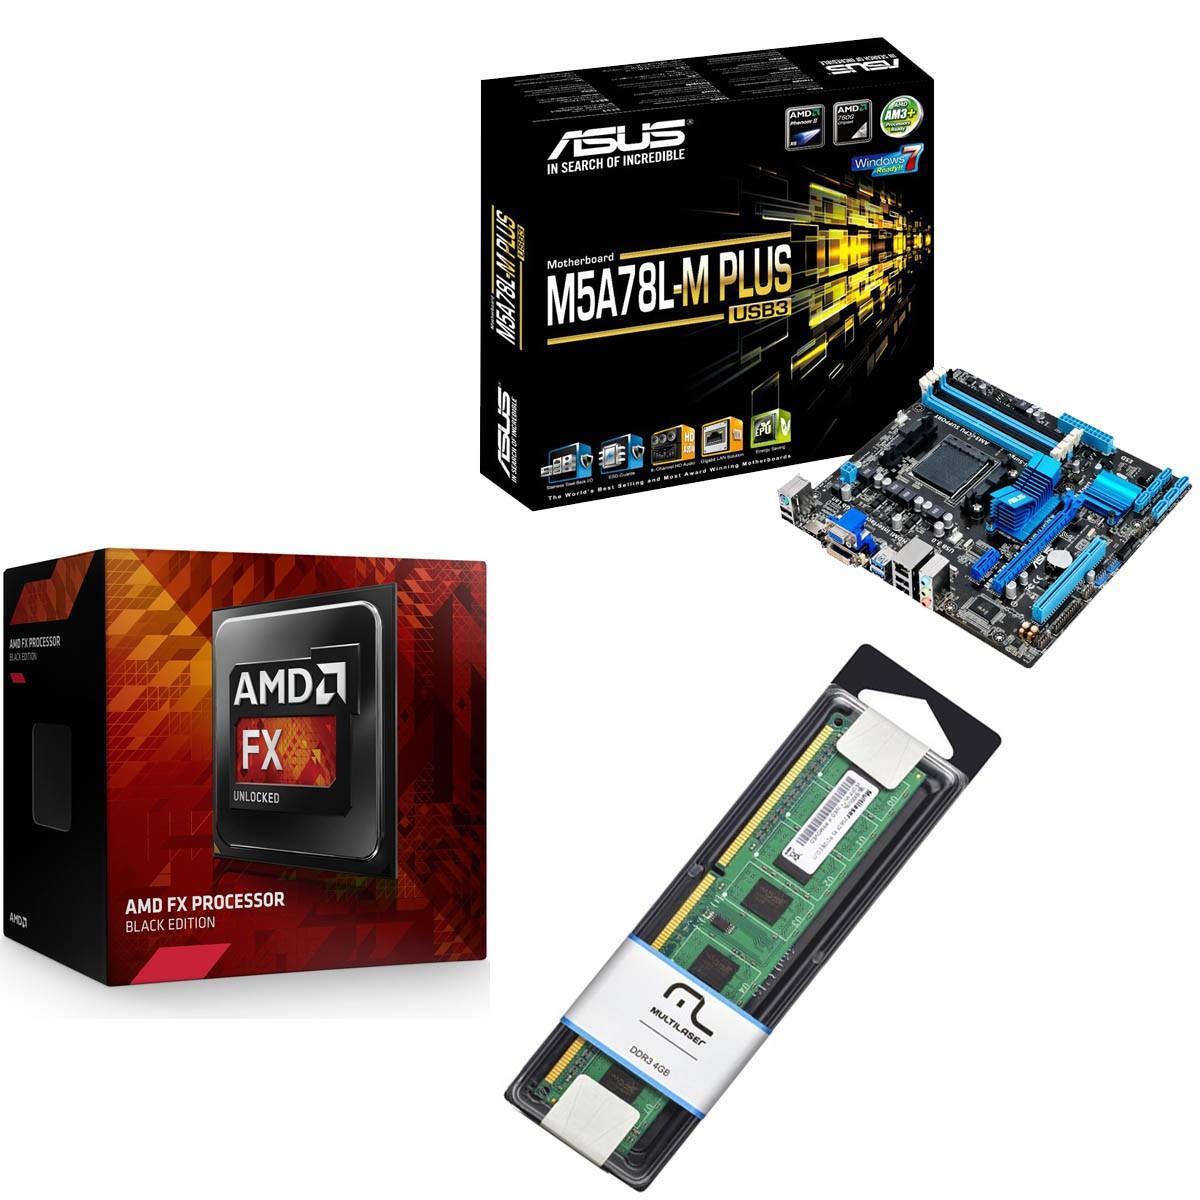 Kit Placa Mae Asus M5a78l M Plus Usb3 Processador Amd Fx 4300 Quad Core